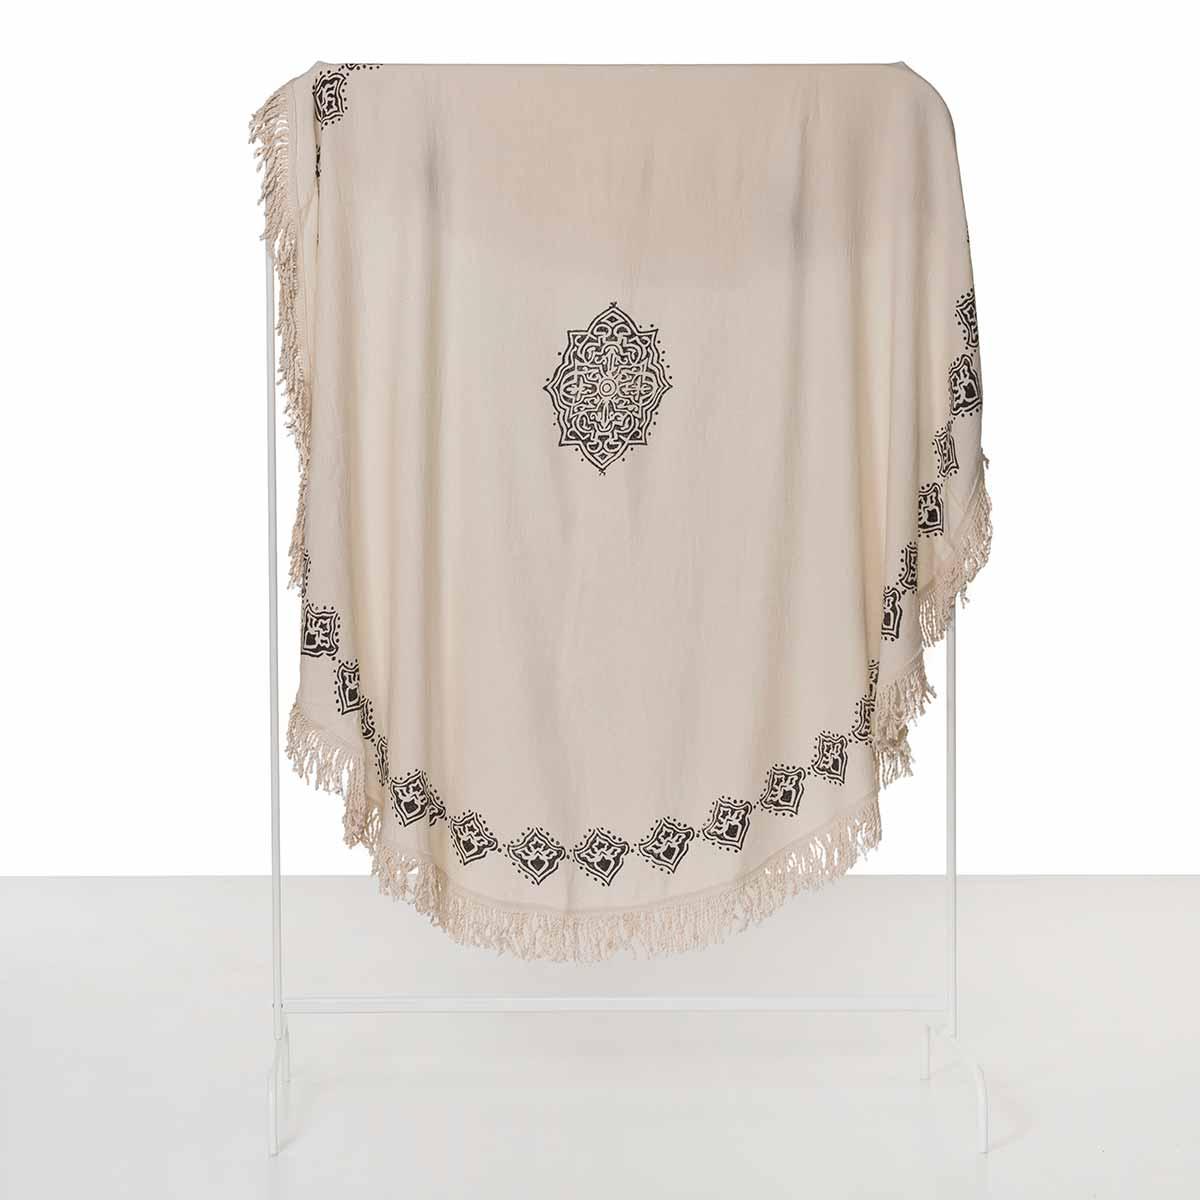 Round Towel / Cloth - Natural / Hand Printed 02 - Black